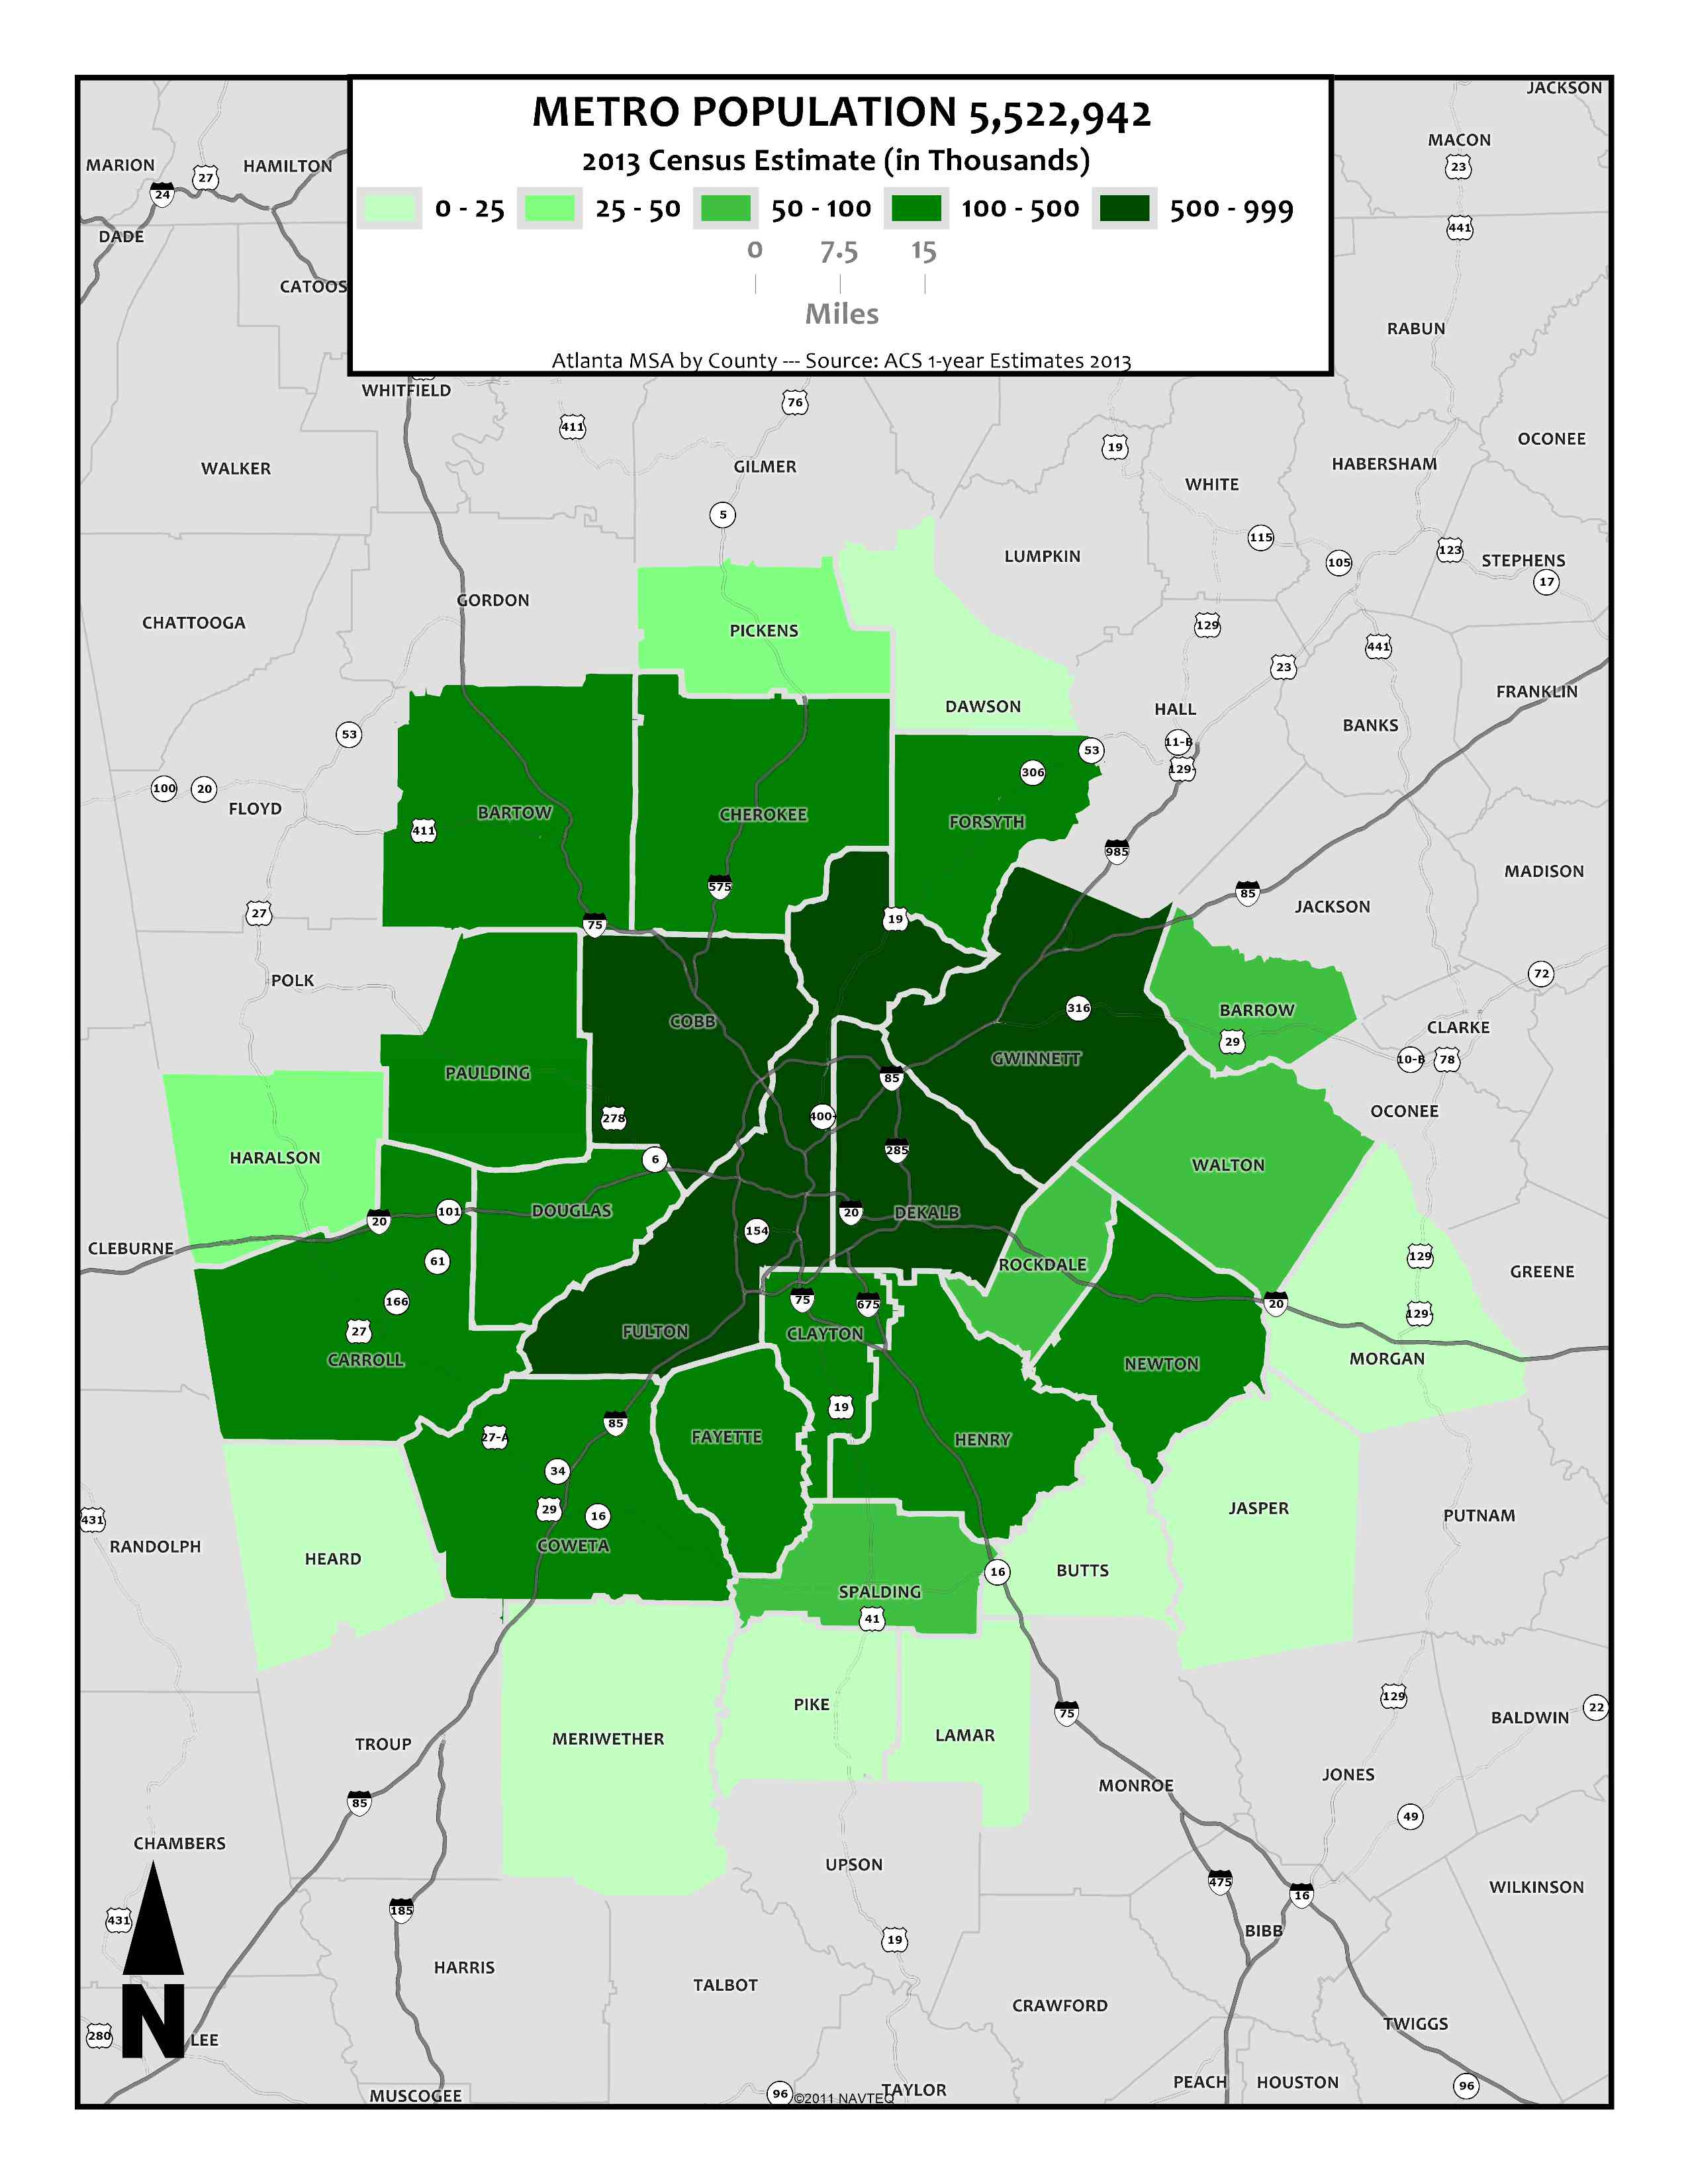 Metro Population 5,522,942 (2013) – metro counties